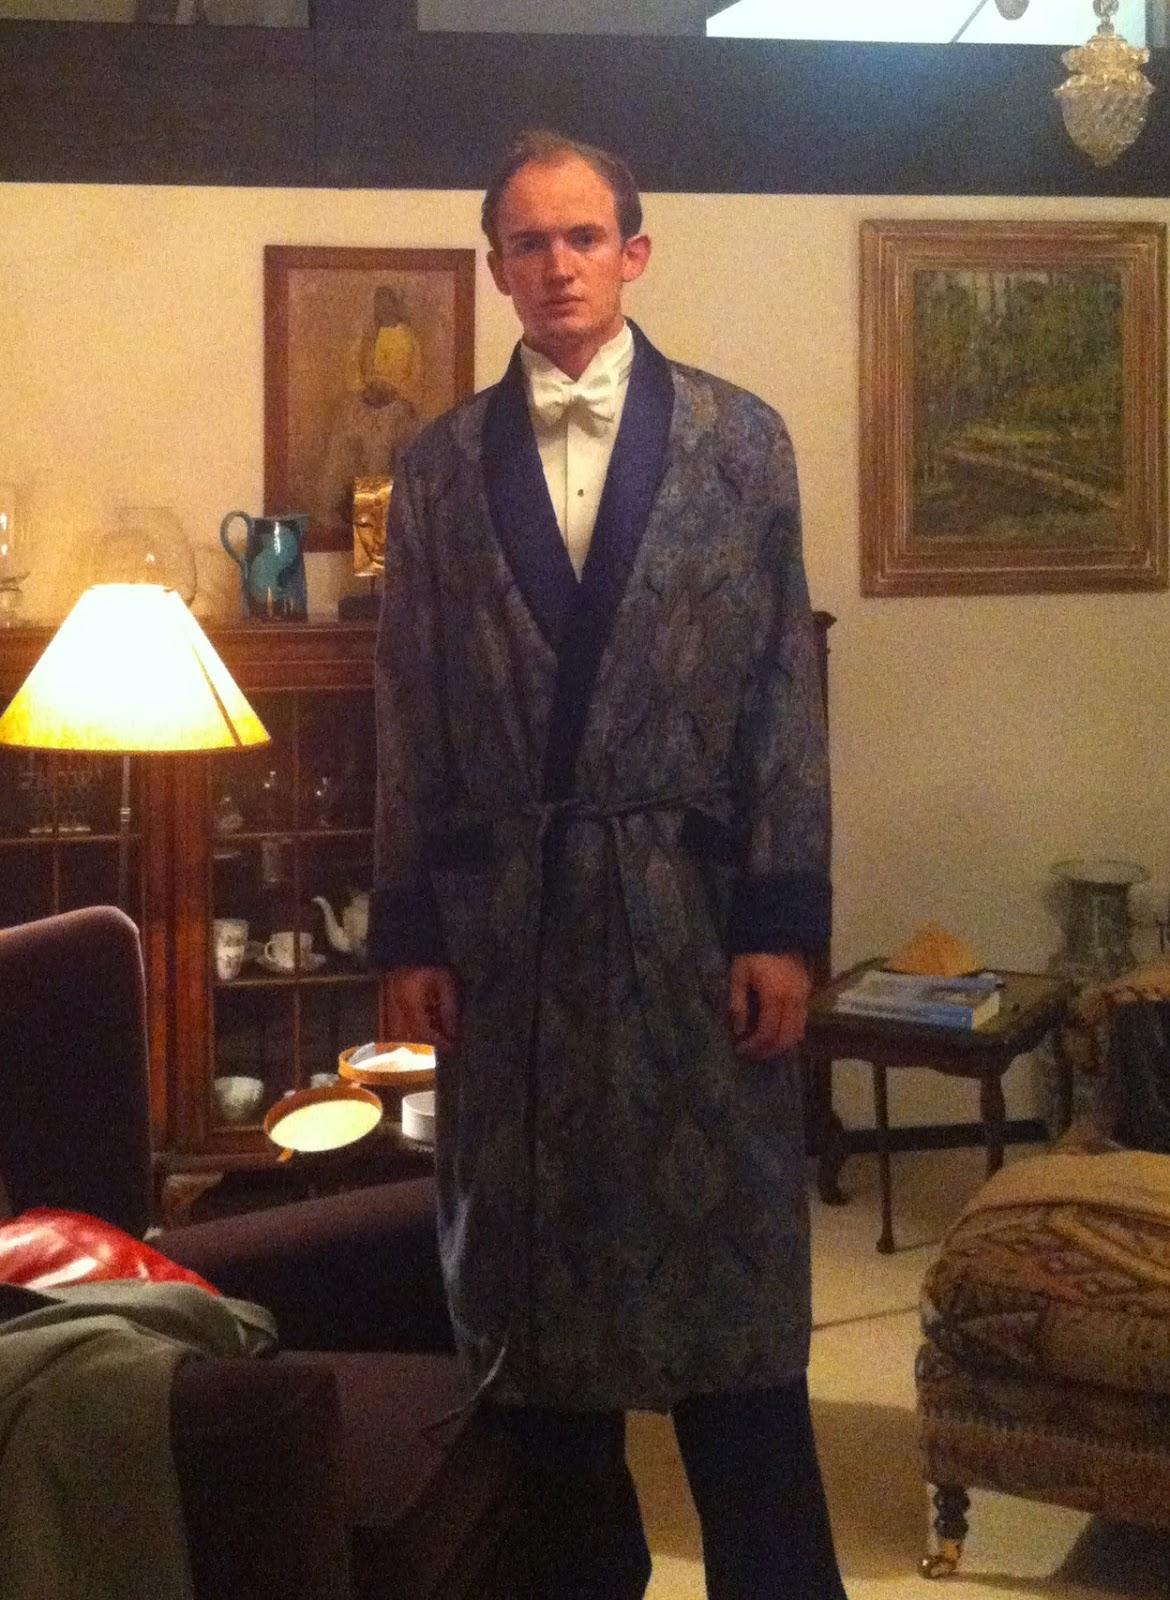 Silk Dressing Gown Mens - Home Decorating Ideas & Interior Design